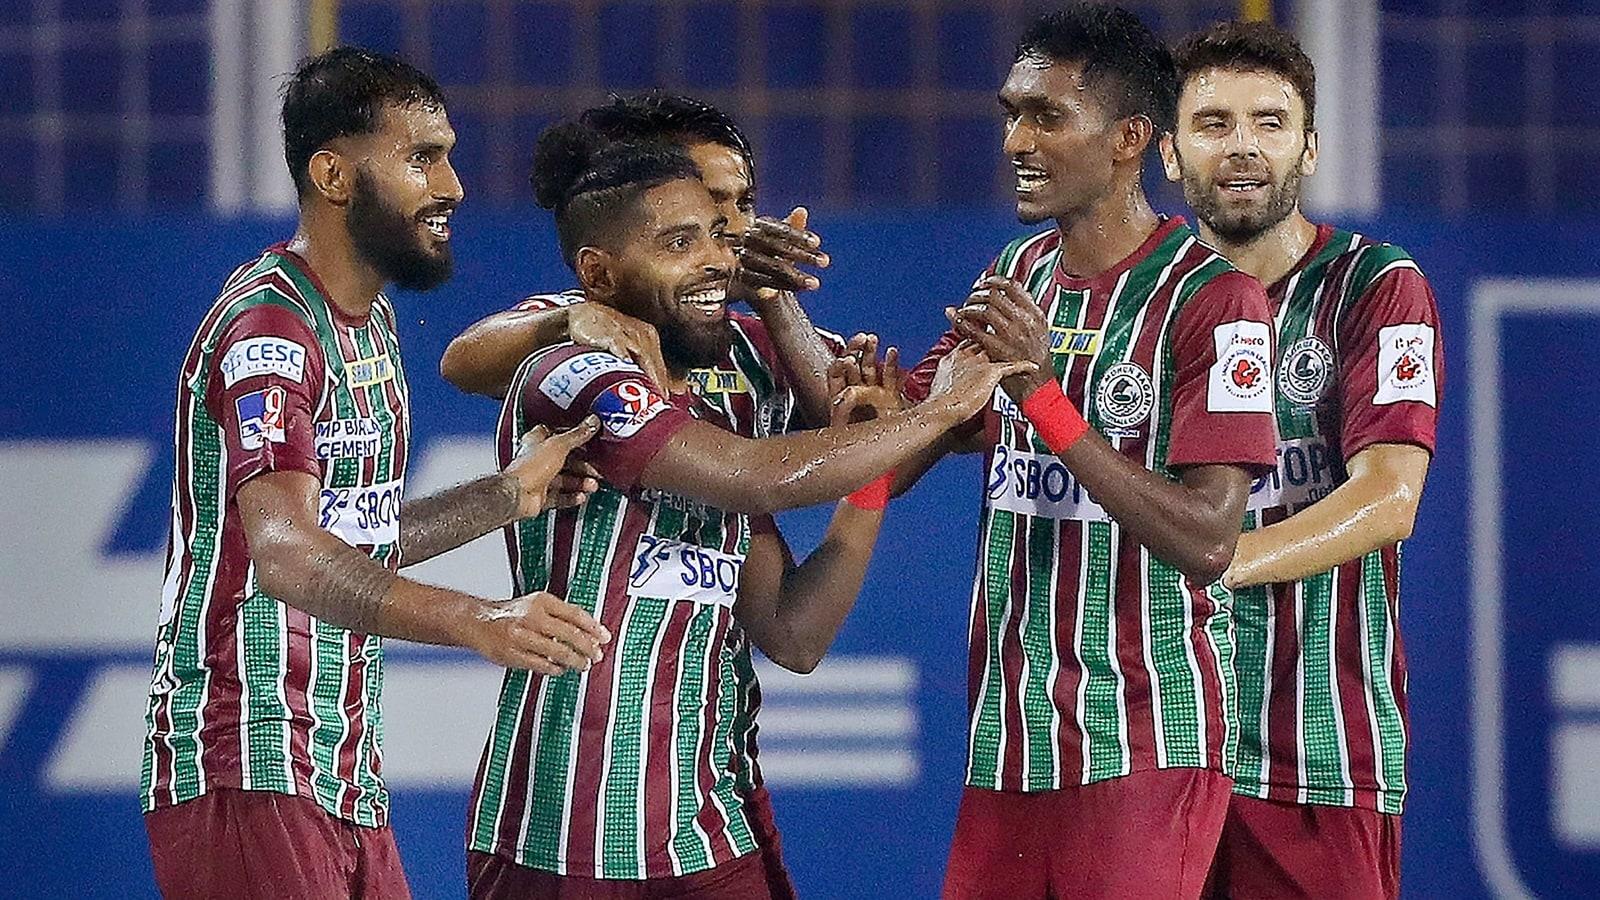 Why ATK Mohun Bagan's Roy Krishna is better than his impressive numbers |  Football News - Hindustan Times